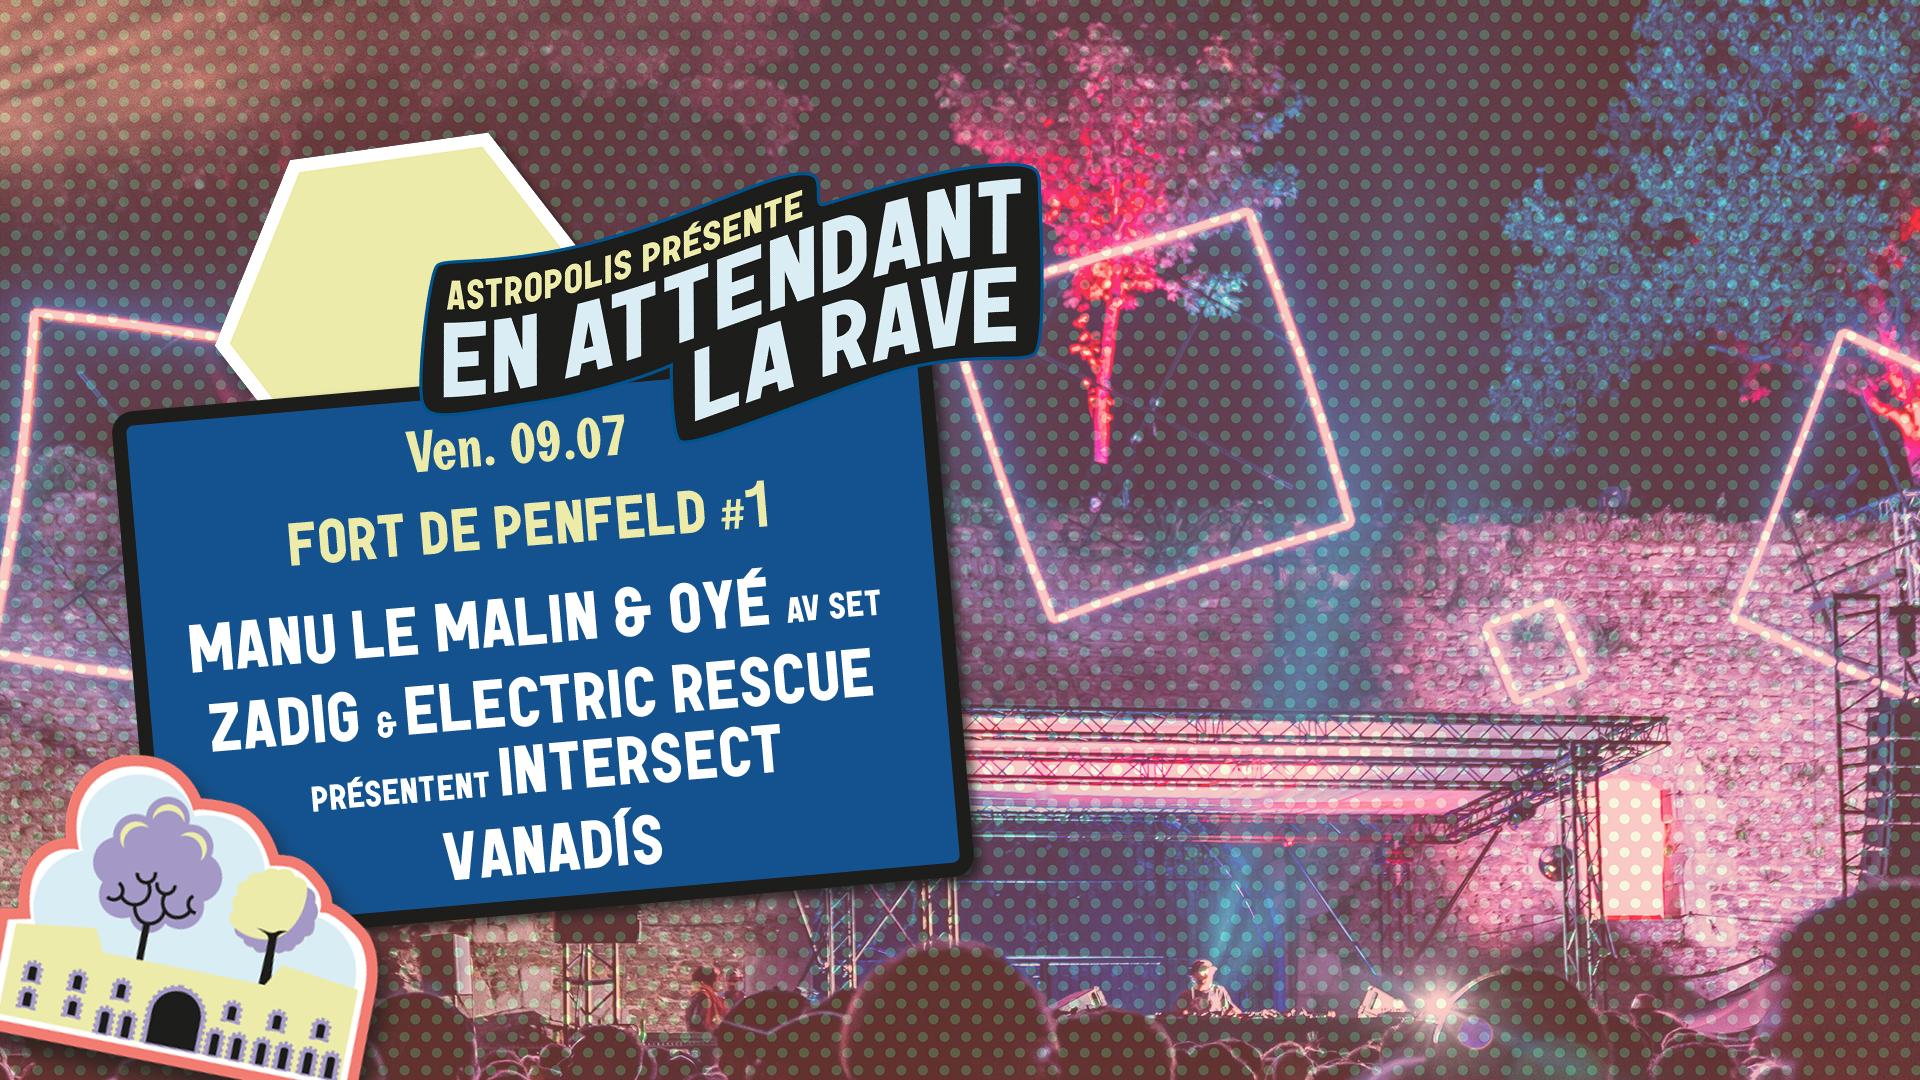 09/07 : Fort de Penfeld #1-  Manu Le Malin & Oyé + Zadig & Electric Rescue + Vanadís